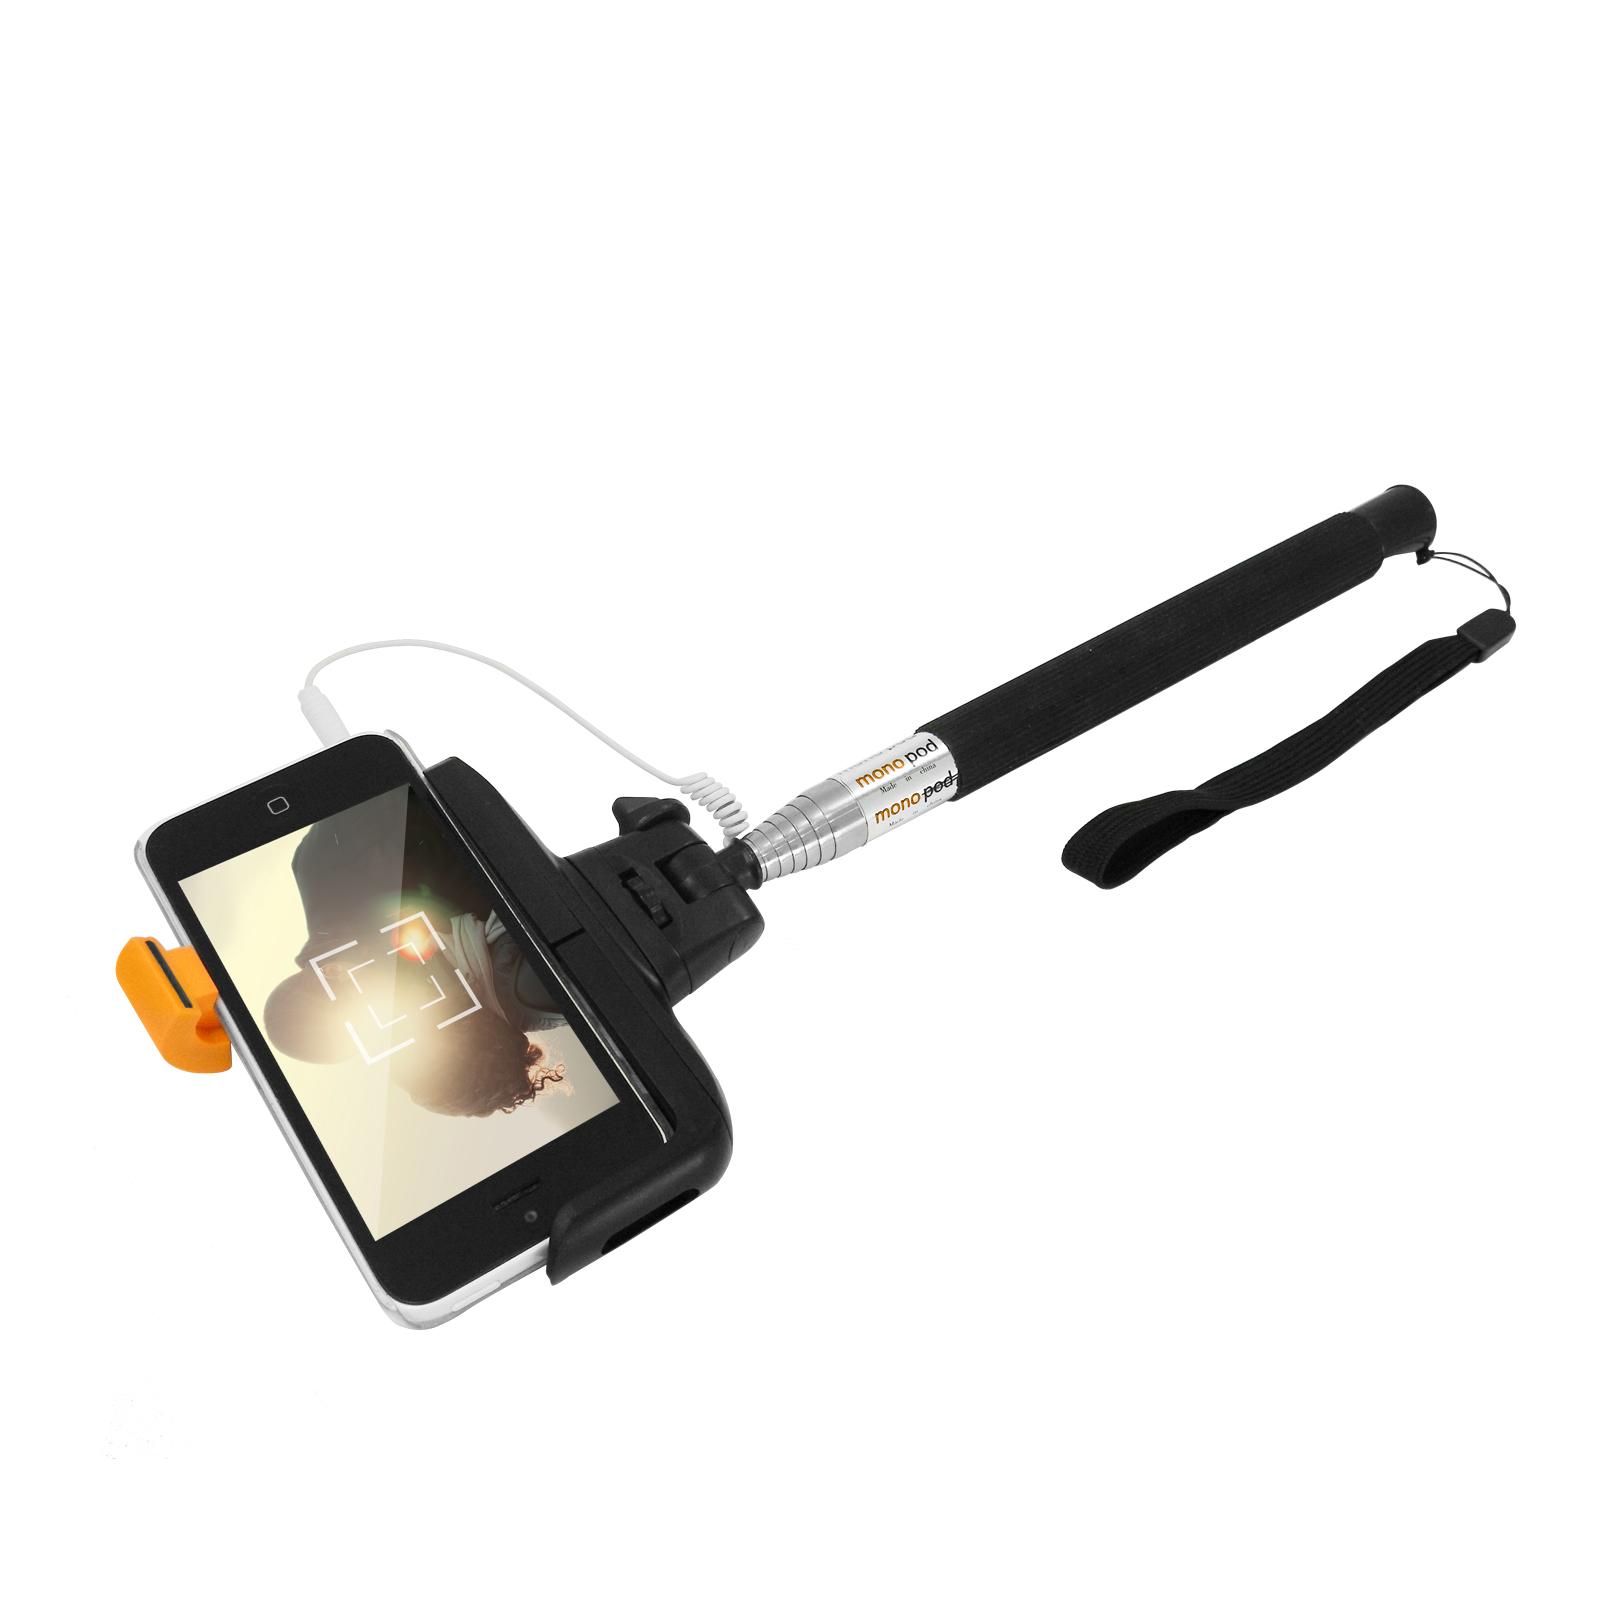 selbstausl ser selfie stick monopod teleskop stab smartphone ios android eaxus ebay. Black Bedroom Furniture Sets. Home Design Ideas